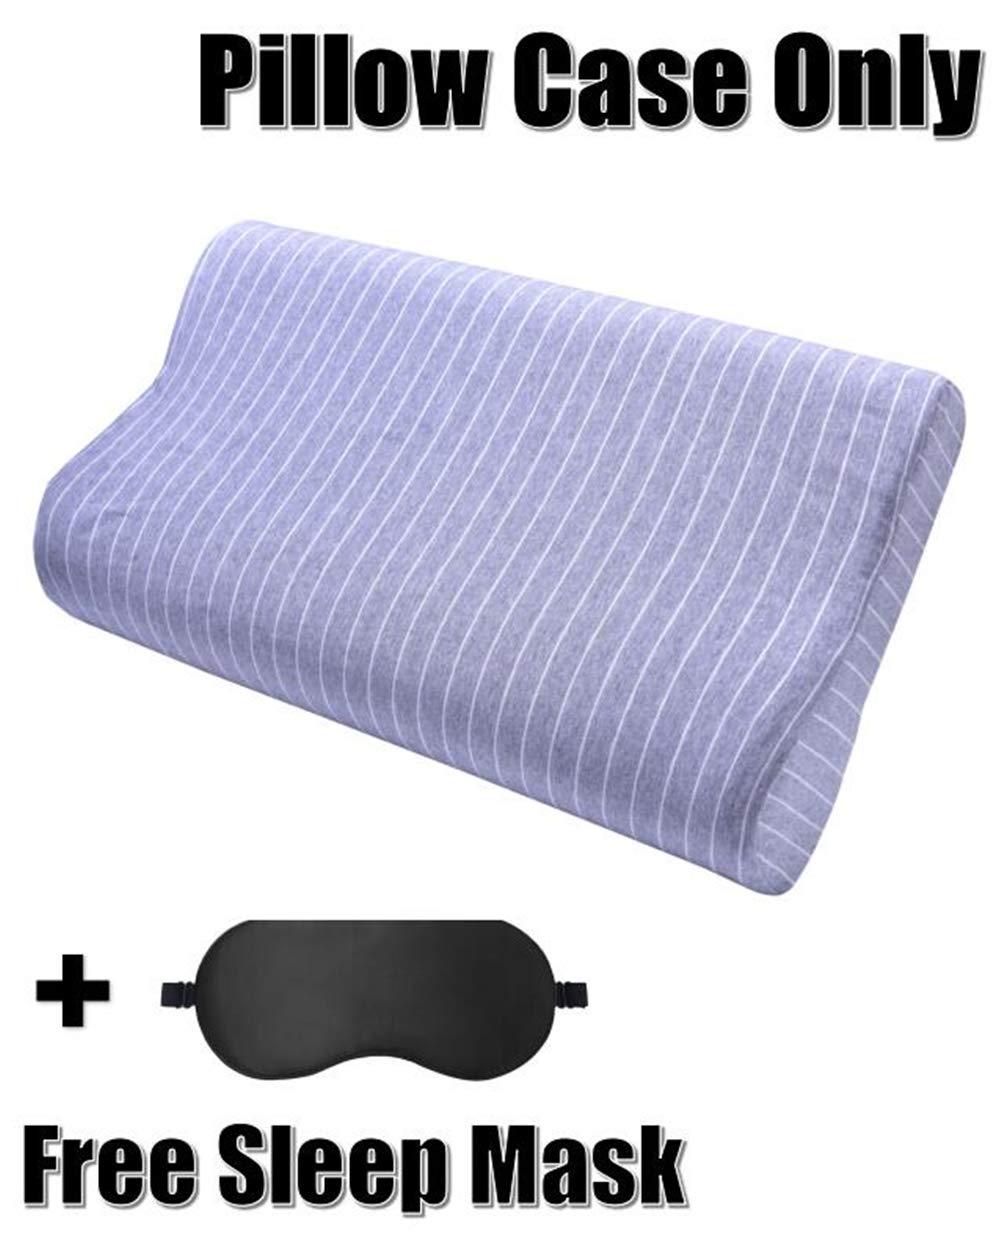 Tempur Pedic Pillow Case Pillow Protector for Memory Foam Contour Pillow Latex Pillow Cervical Pillow,Soft Cotton Fully Hidden Zippered Protection